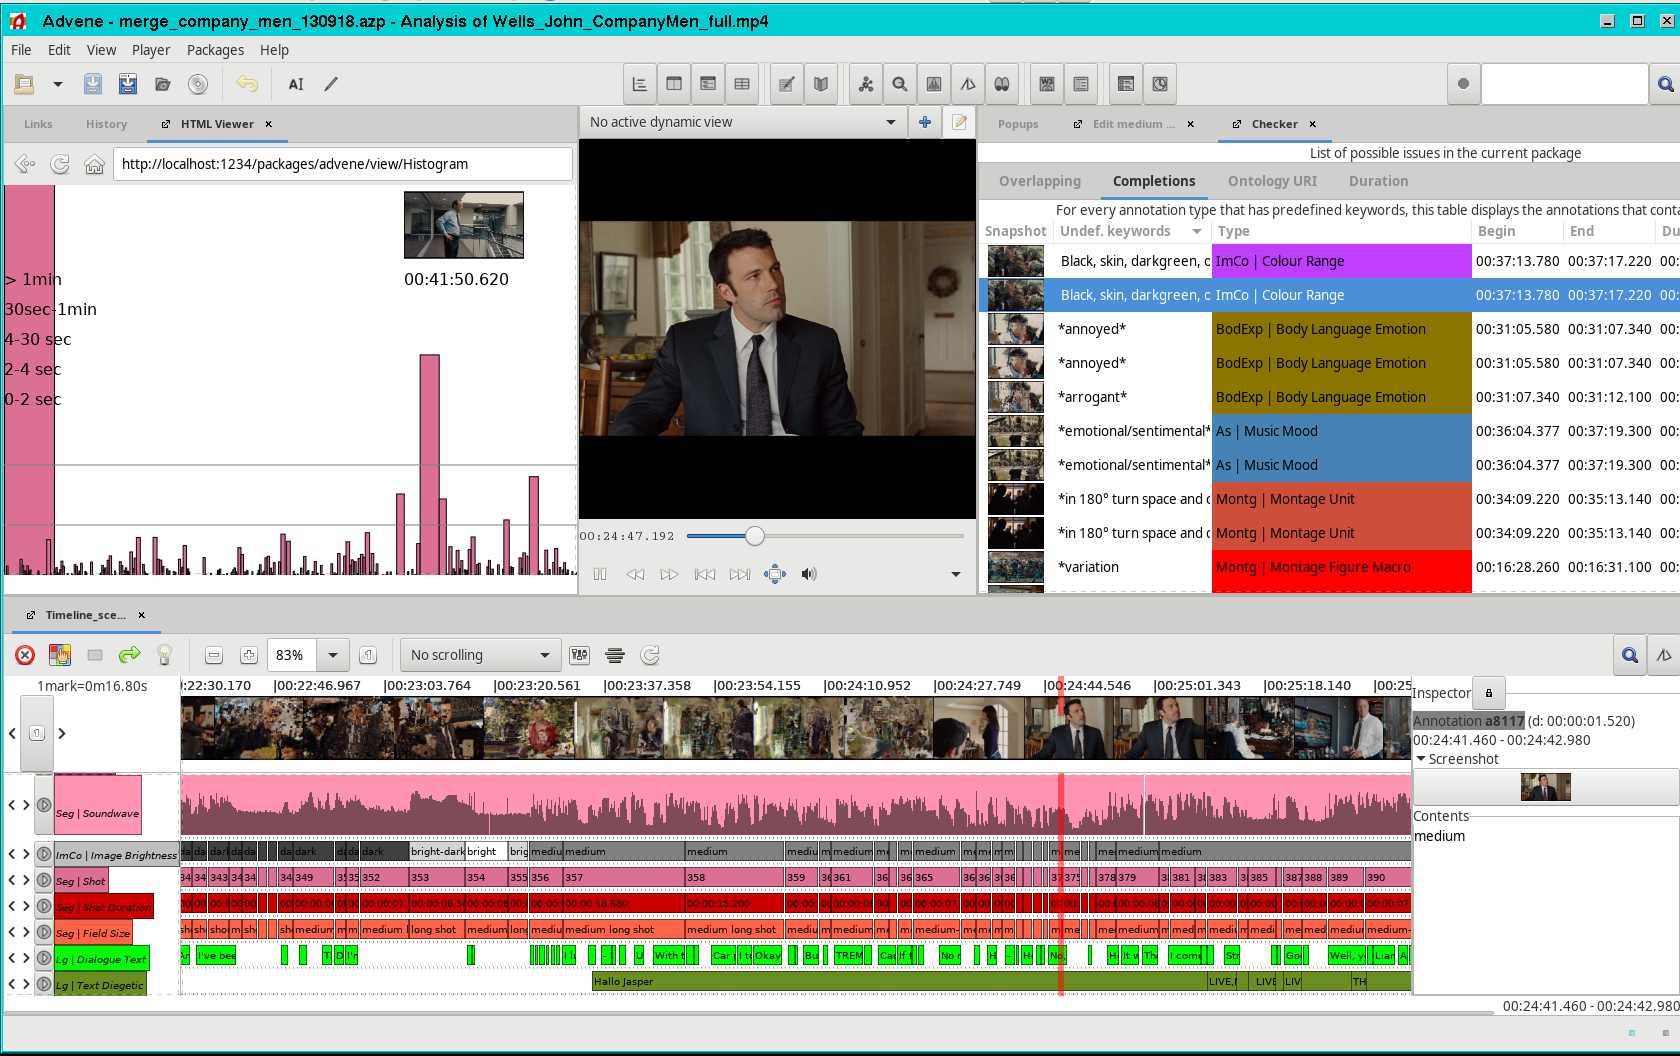 Screenshot of Advene display project data